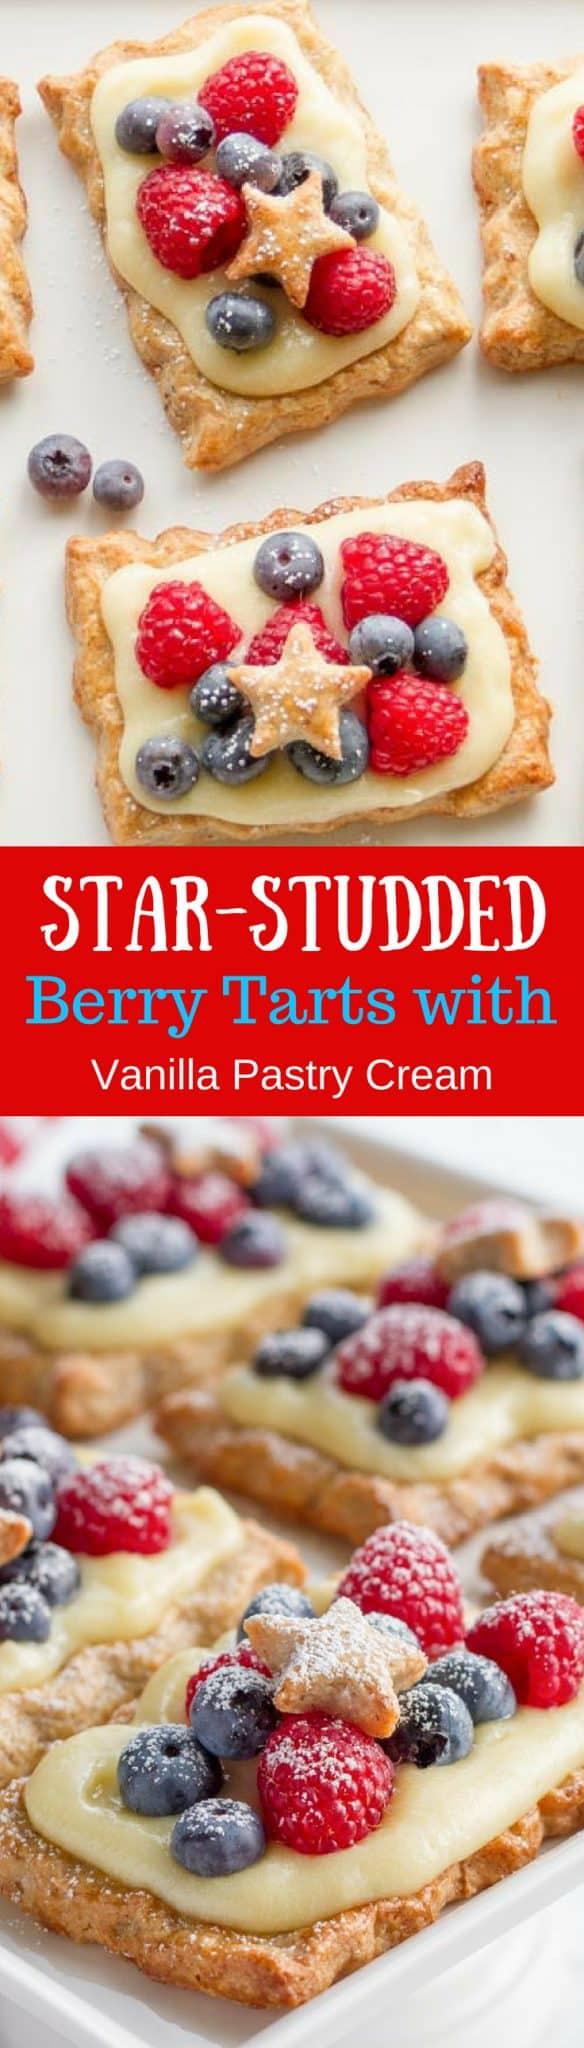 Star-Studded Berry Tarts with Vanilla Pastry Cream / www.savingdessert.com